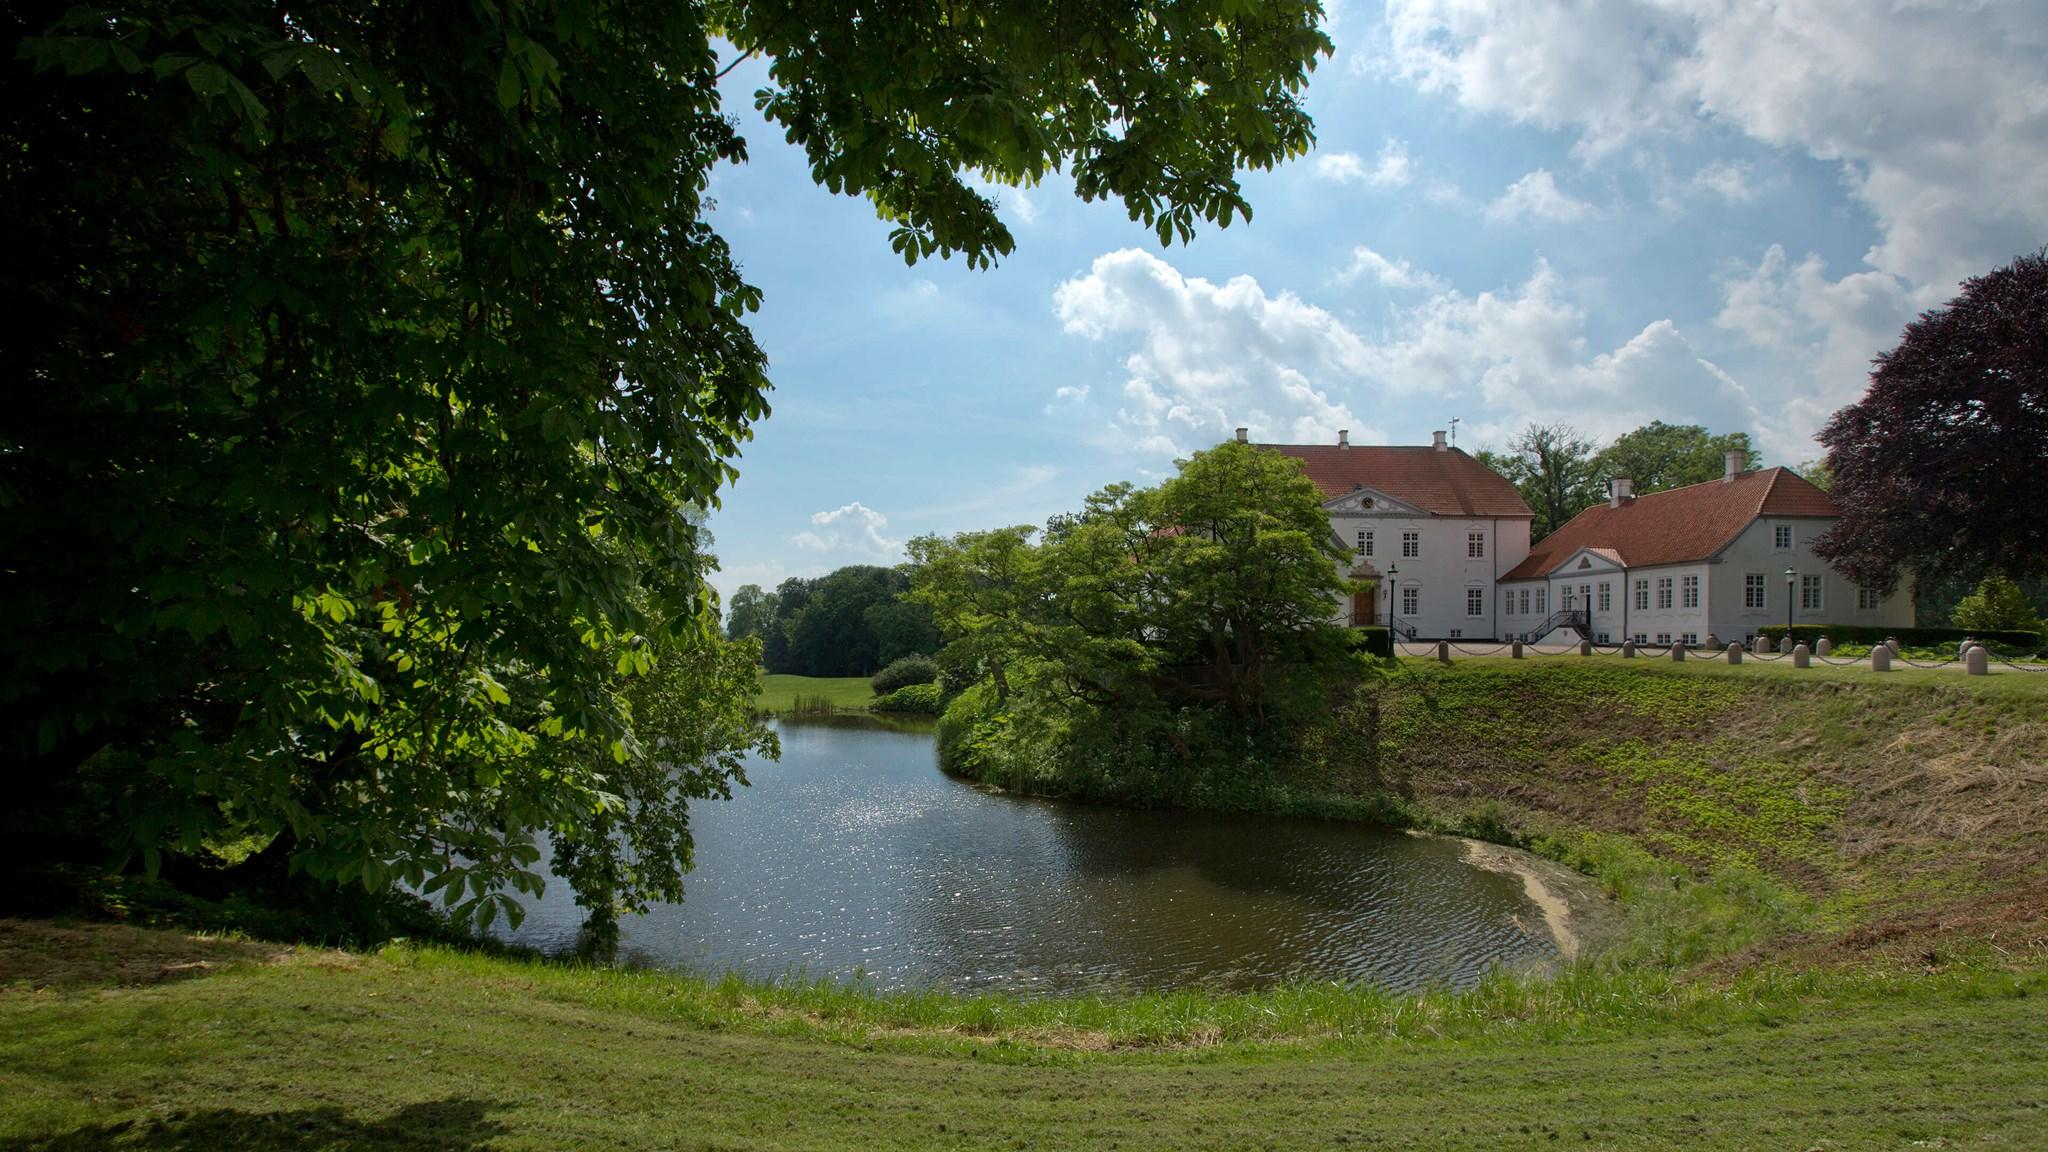 The Schou Foundation Owns Palsgaard Manor